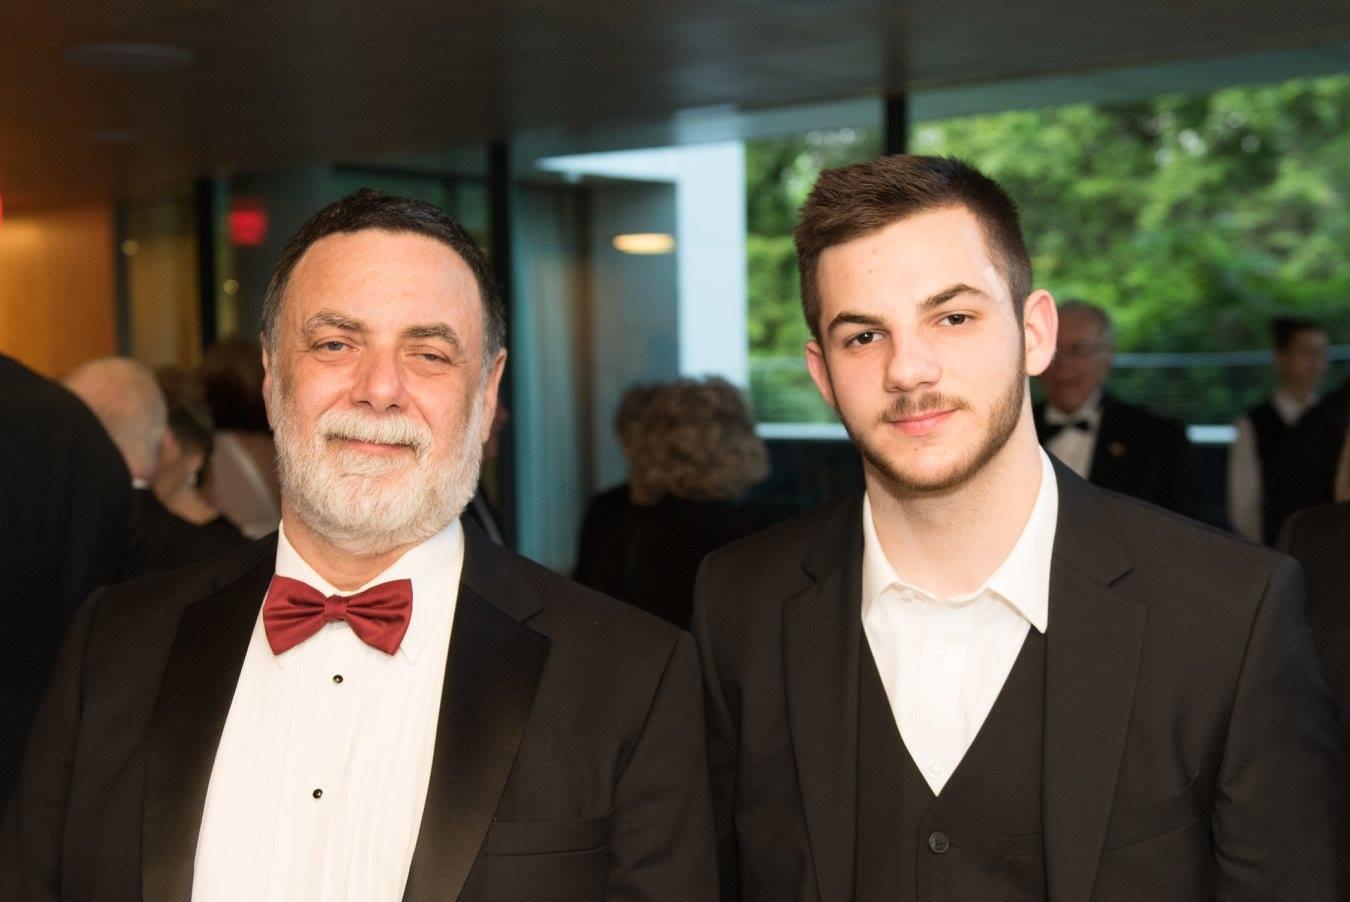 Dr. Tamás Fellegi and his son Mr. Benjámin Fellegi